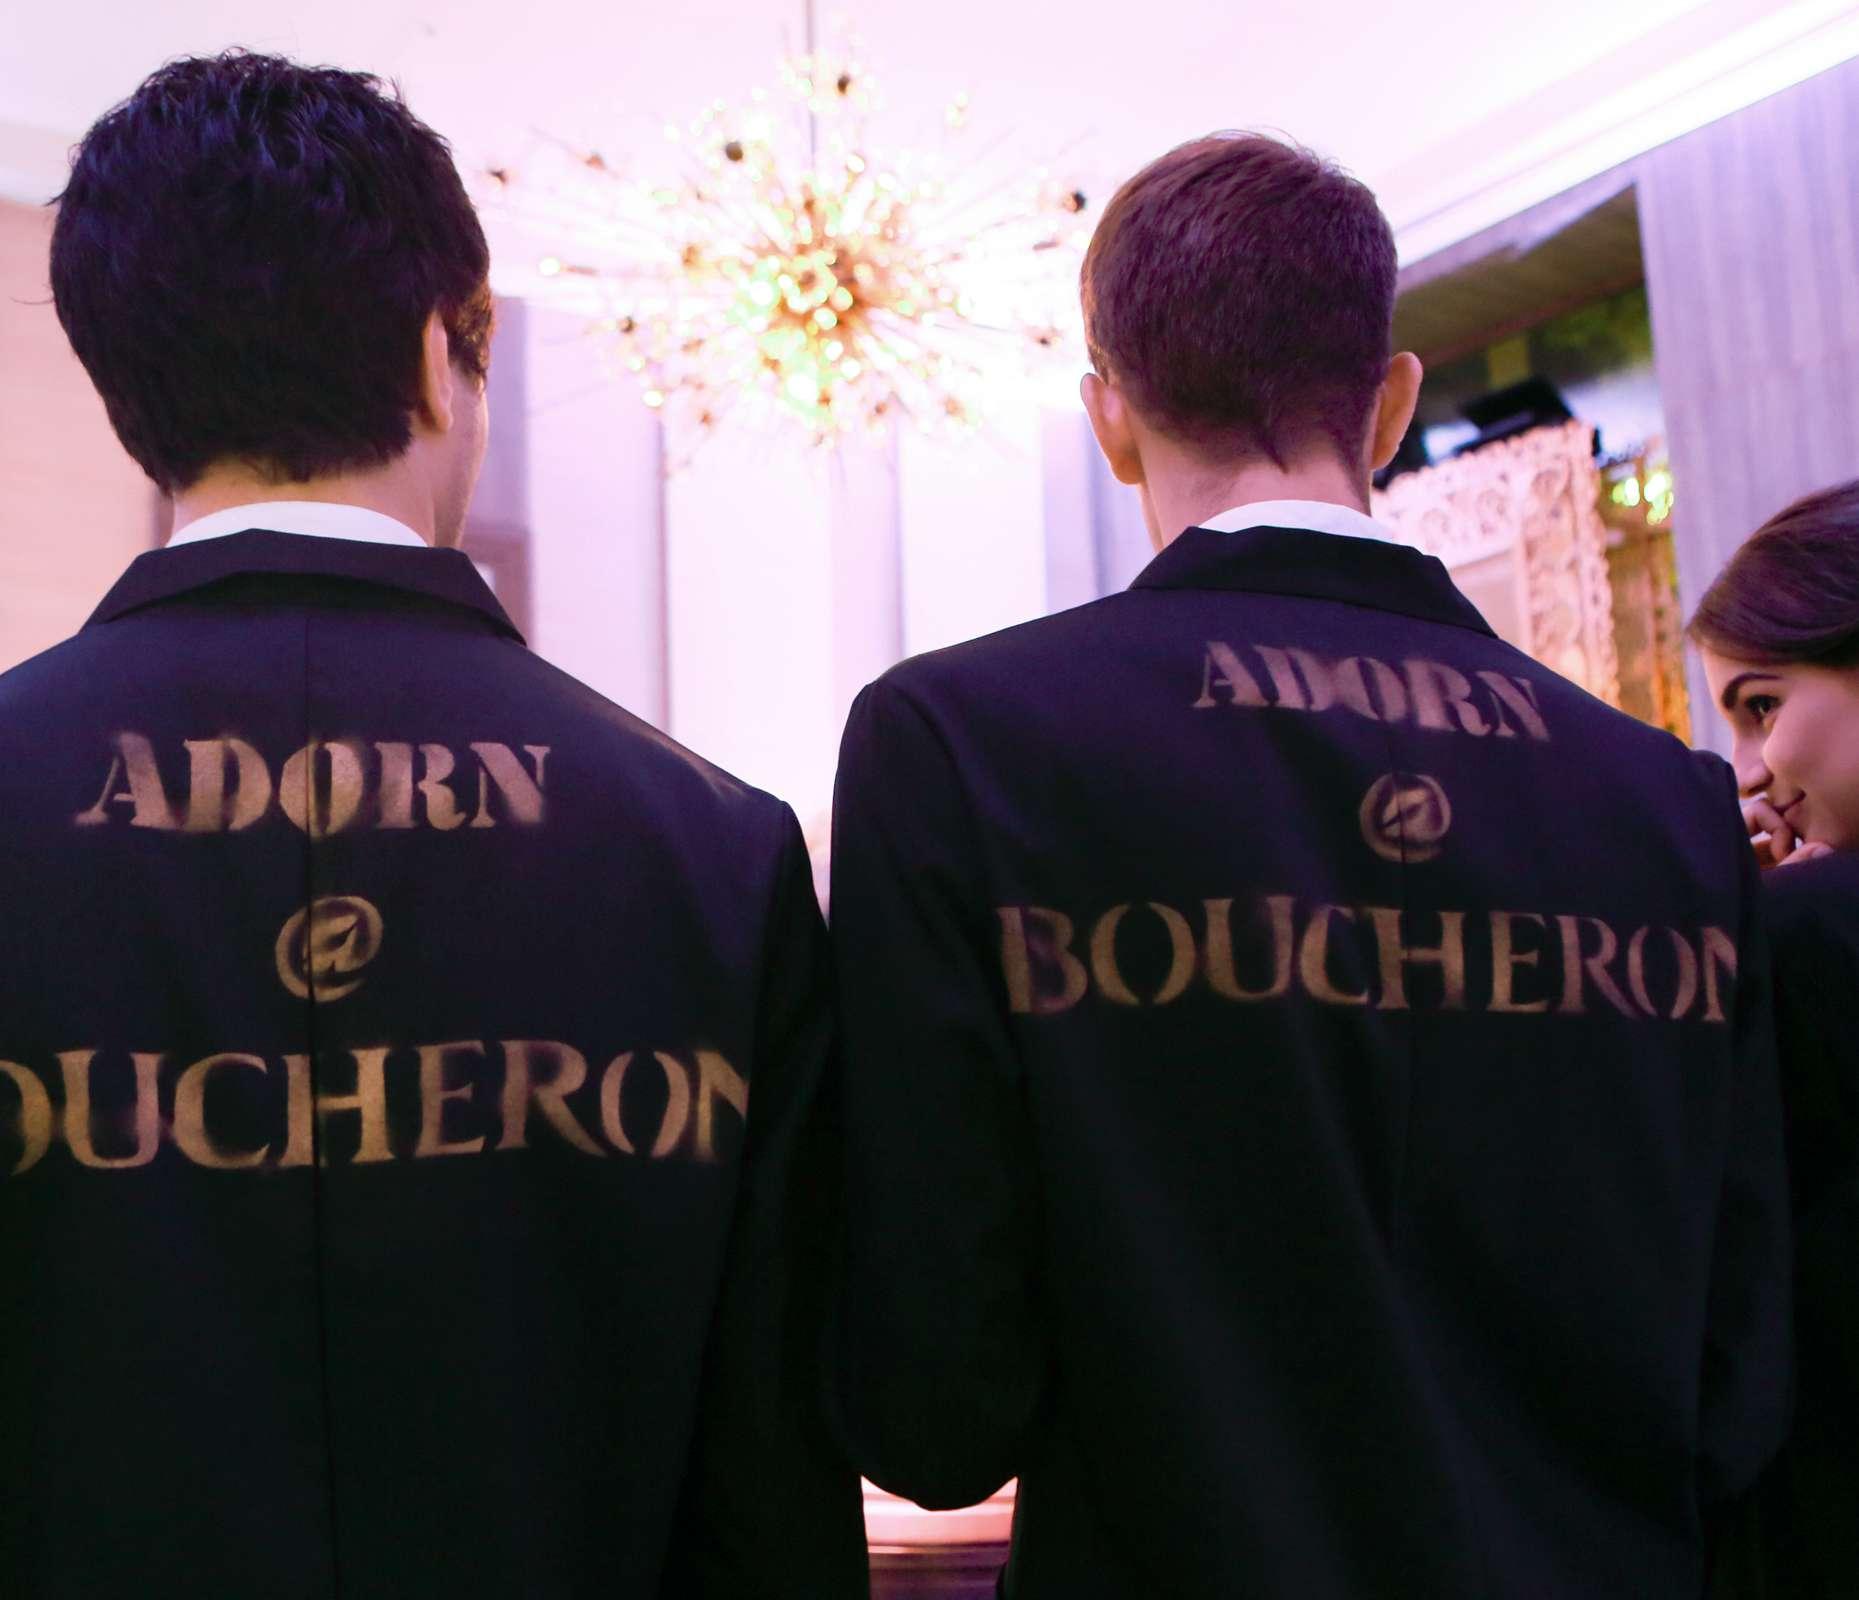 boucheron_adorn_01_1